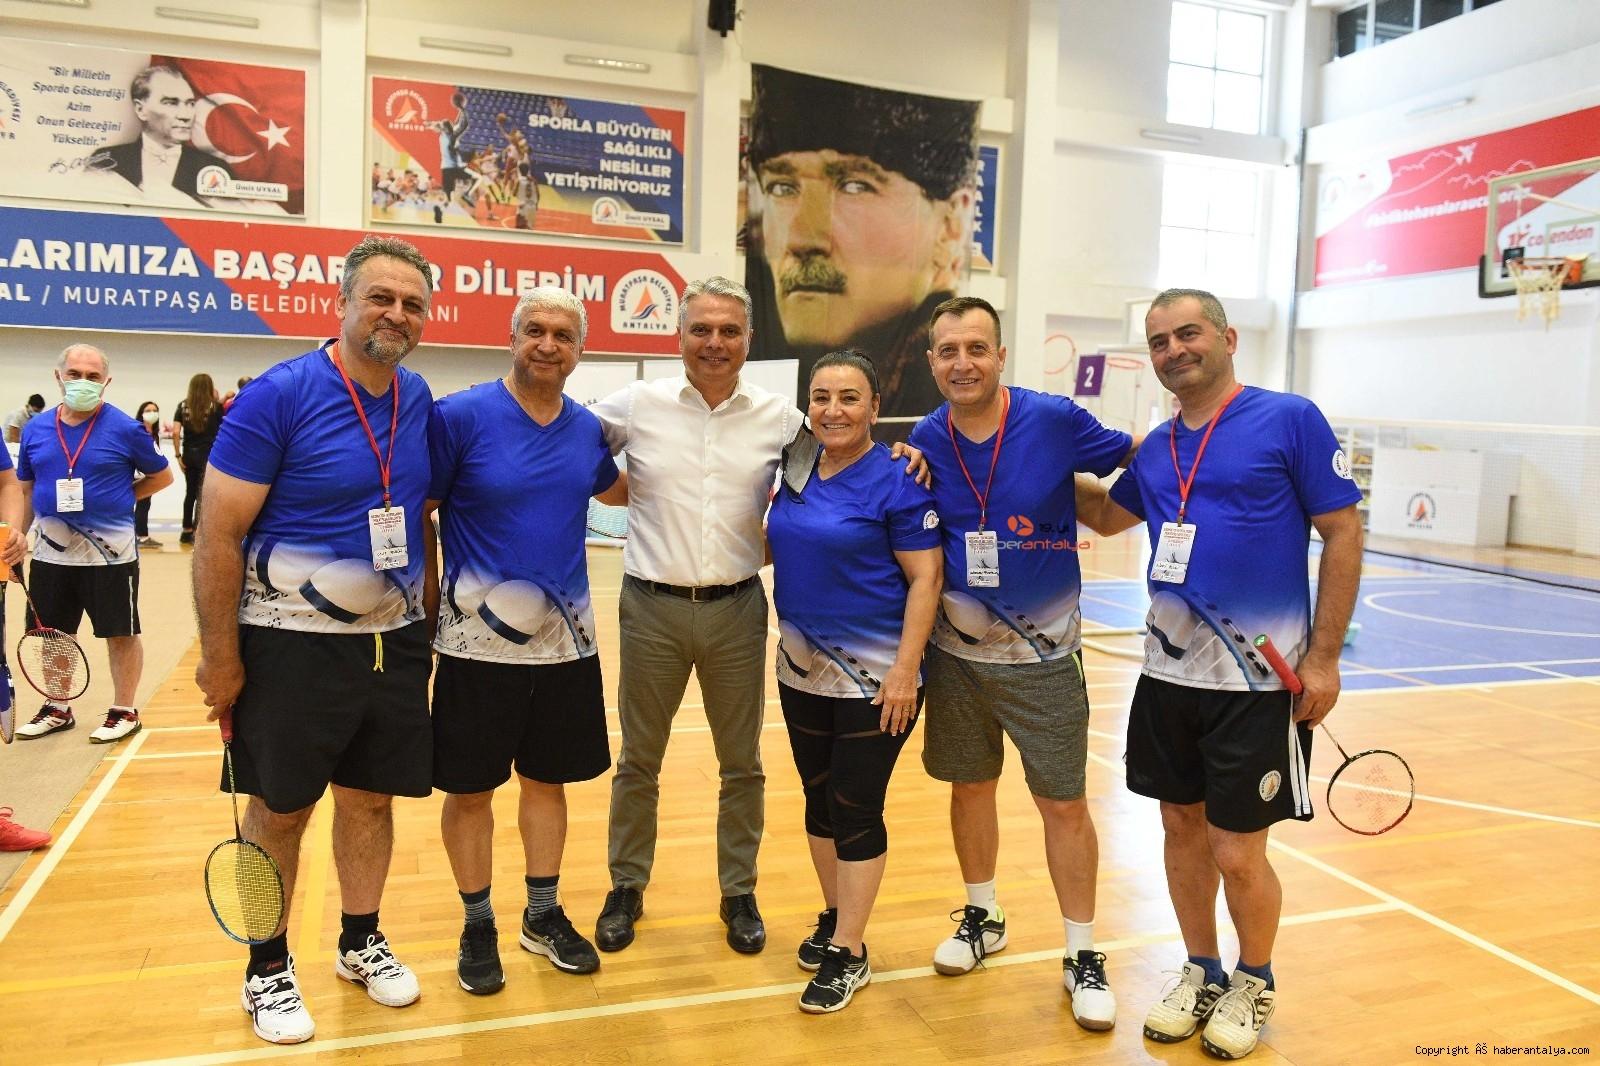 2021/06/badminton-senligi-acilis-vurusu-baskan-uysaldan-20210624AW35-2.jpg